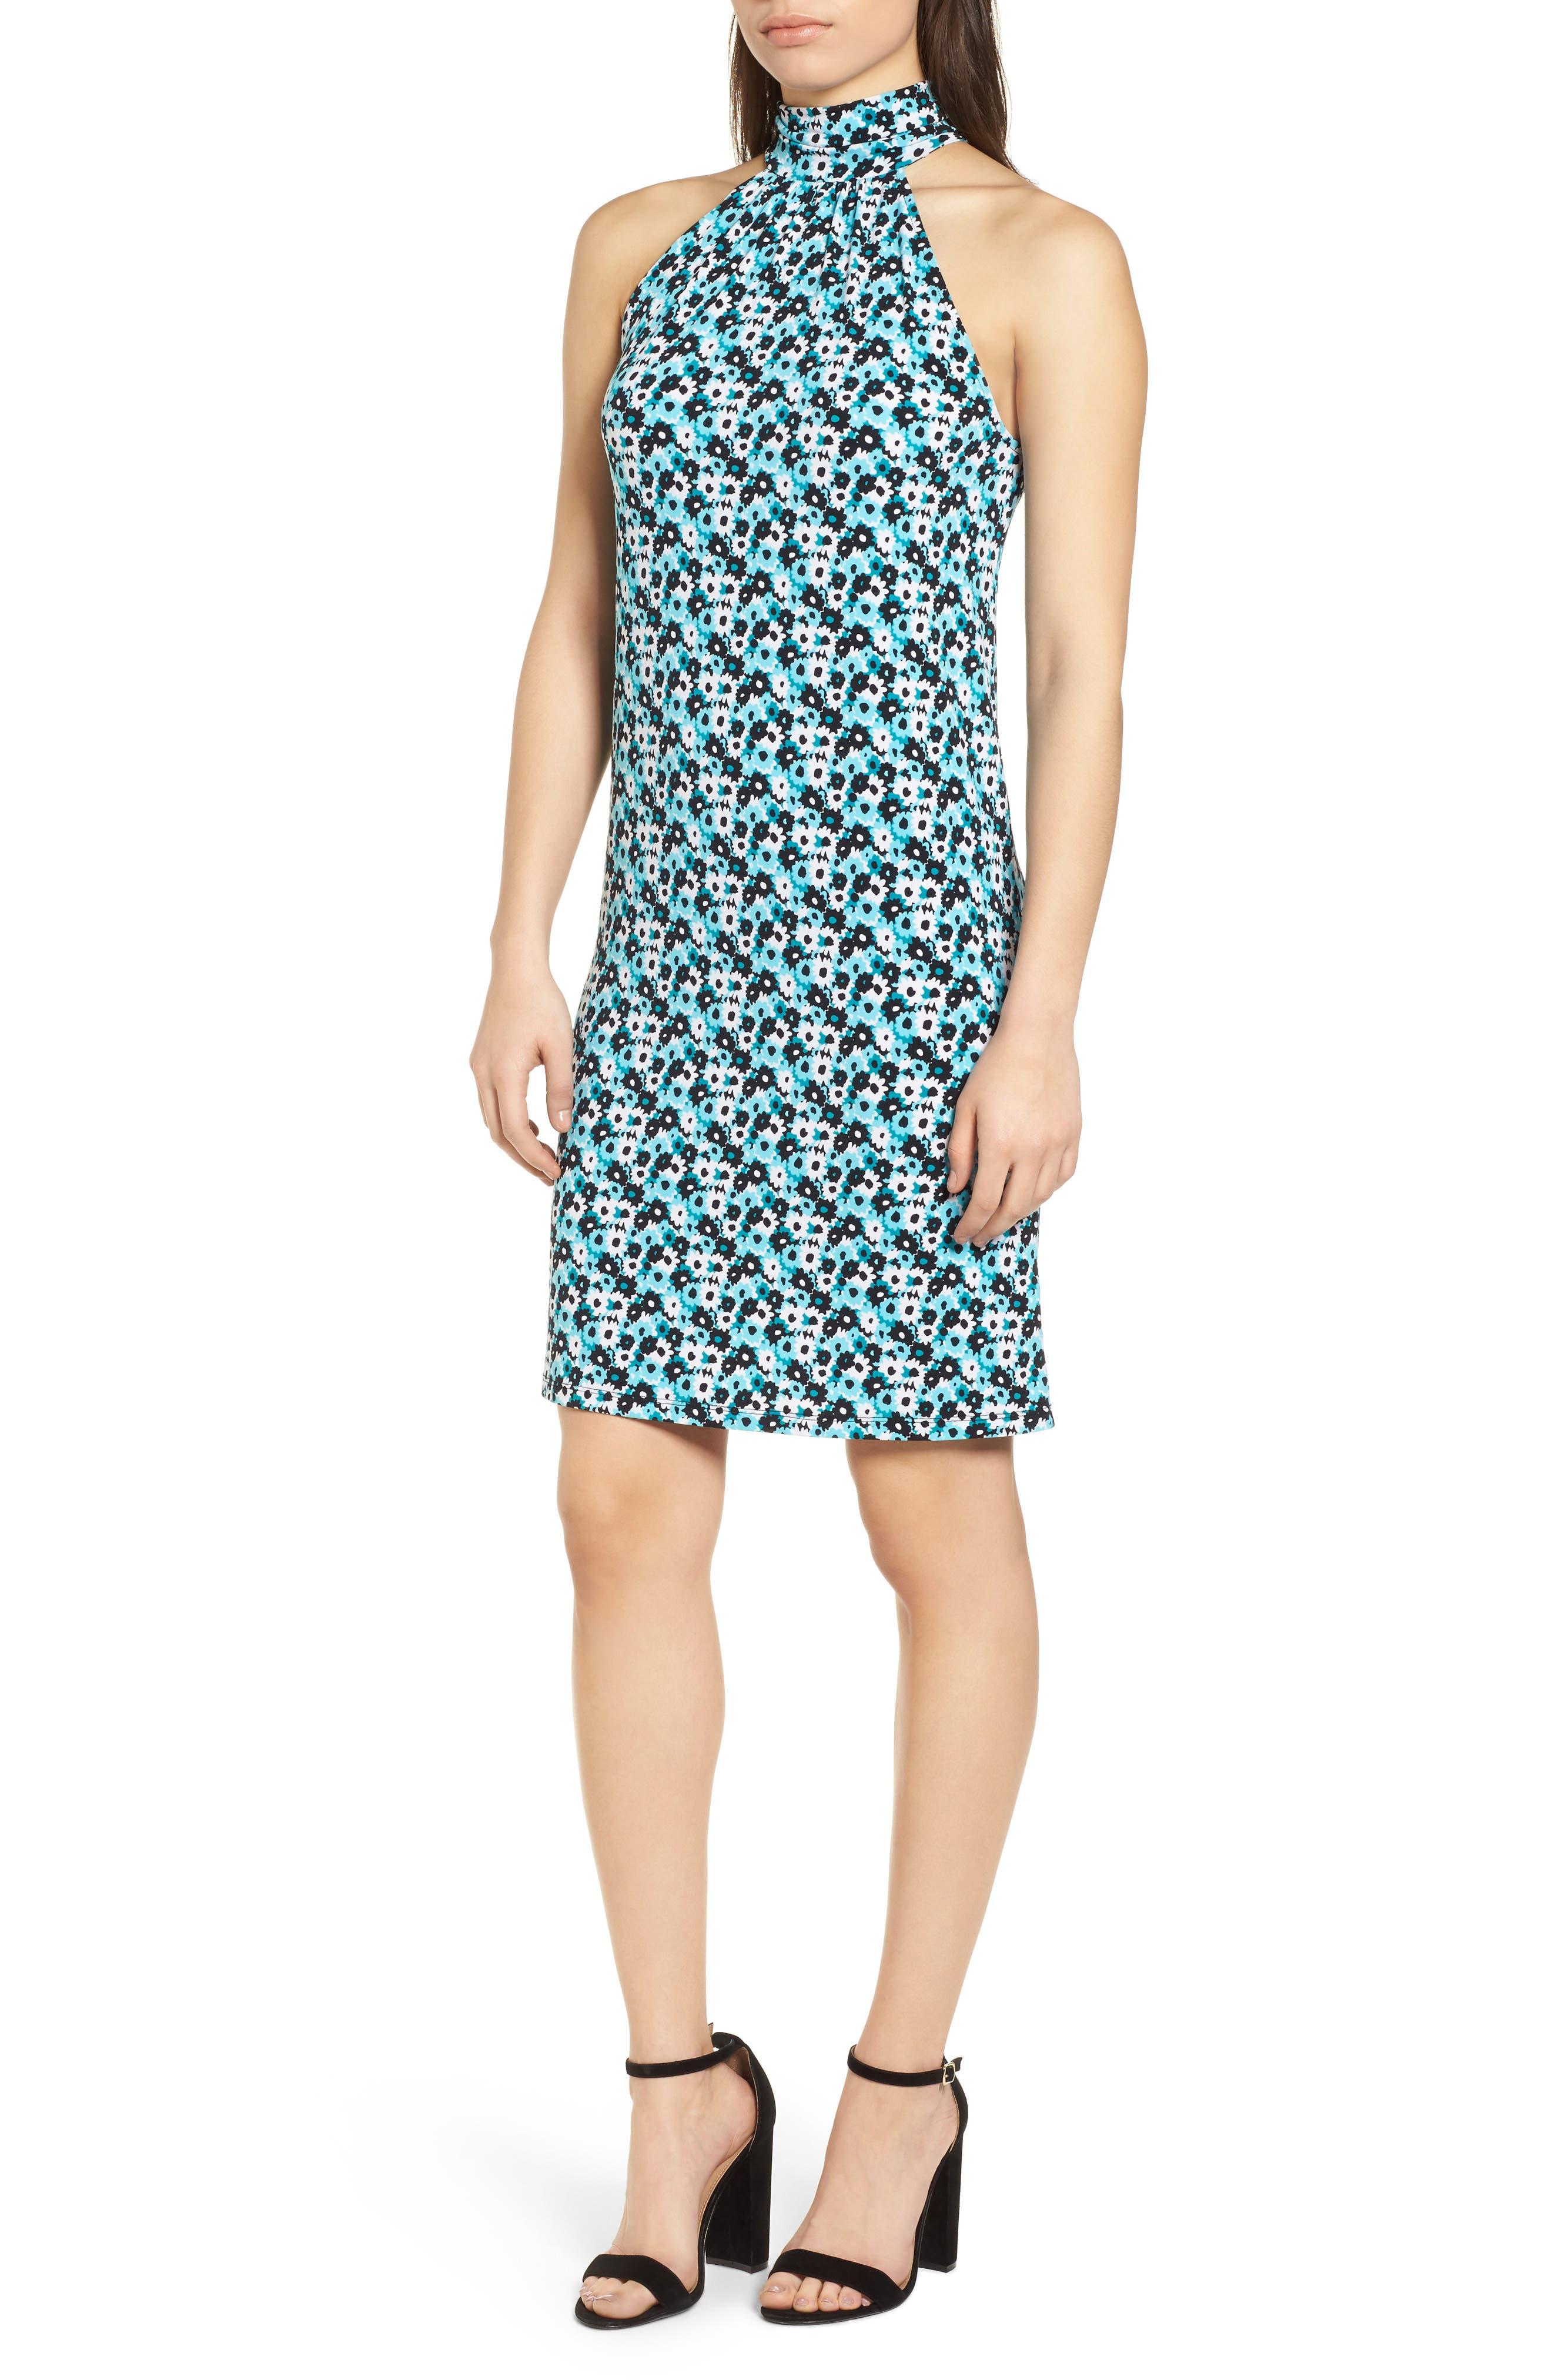 Carnation Sleeveless Dress,                             Main thumbnail 1, color,                             Tile Blue/ Black Multi